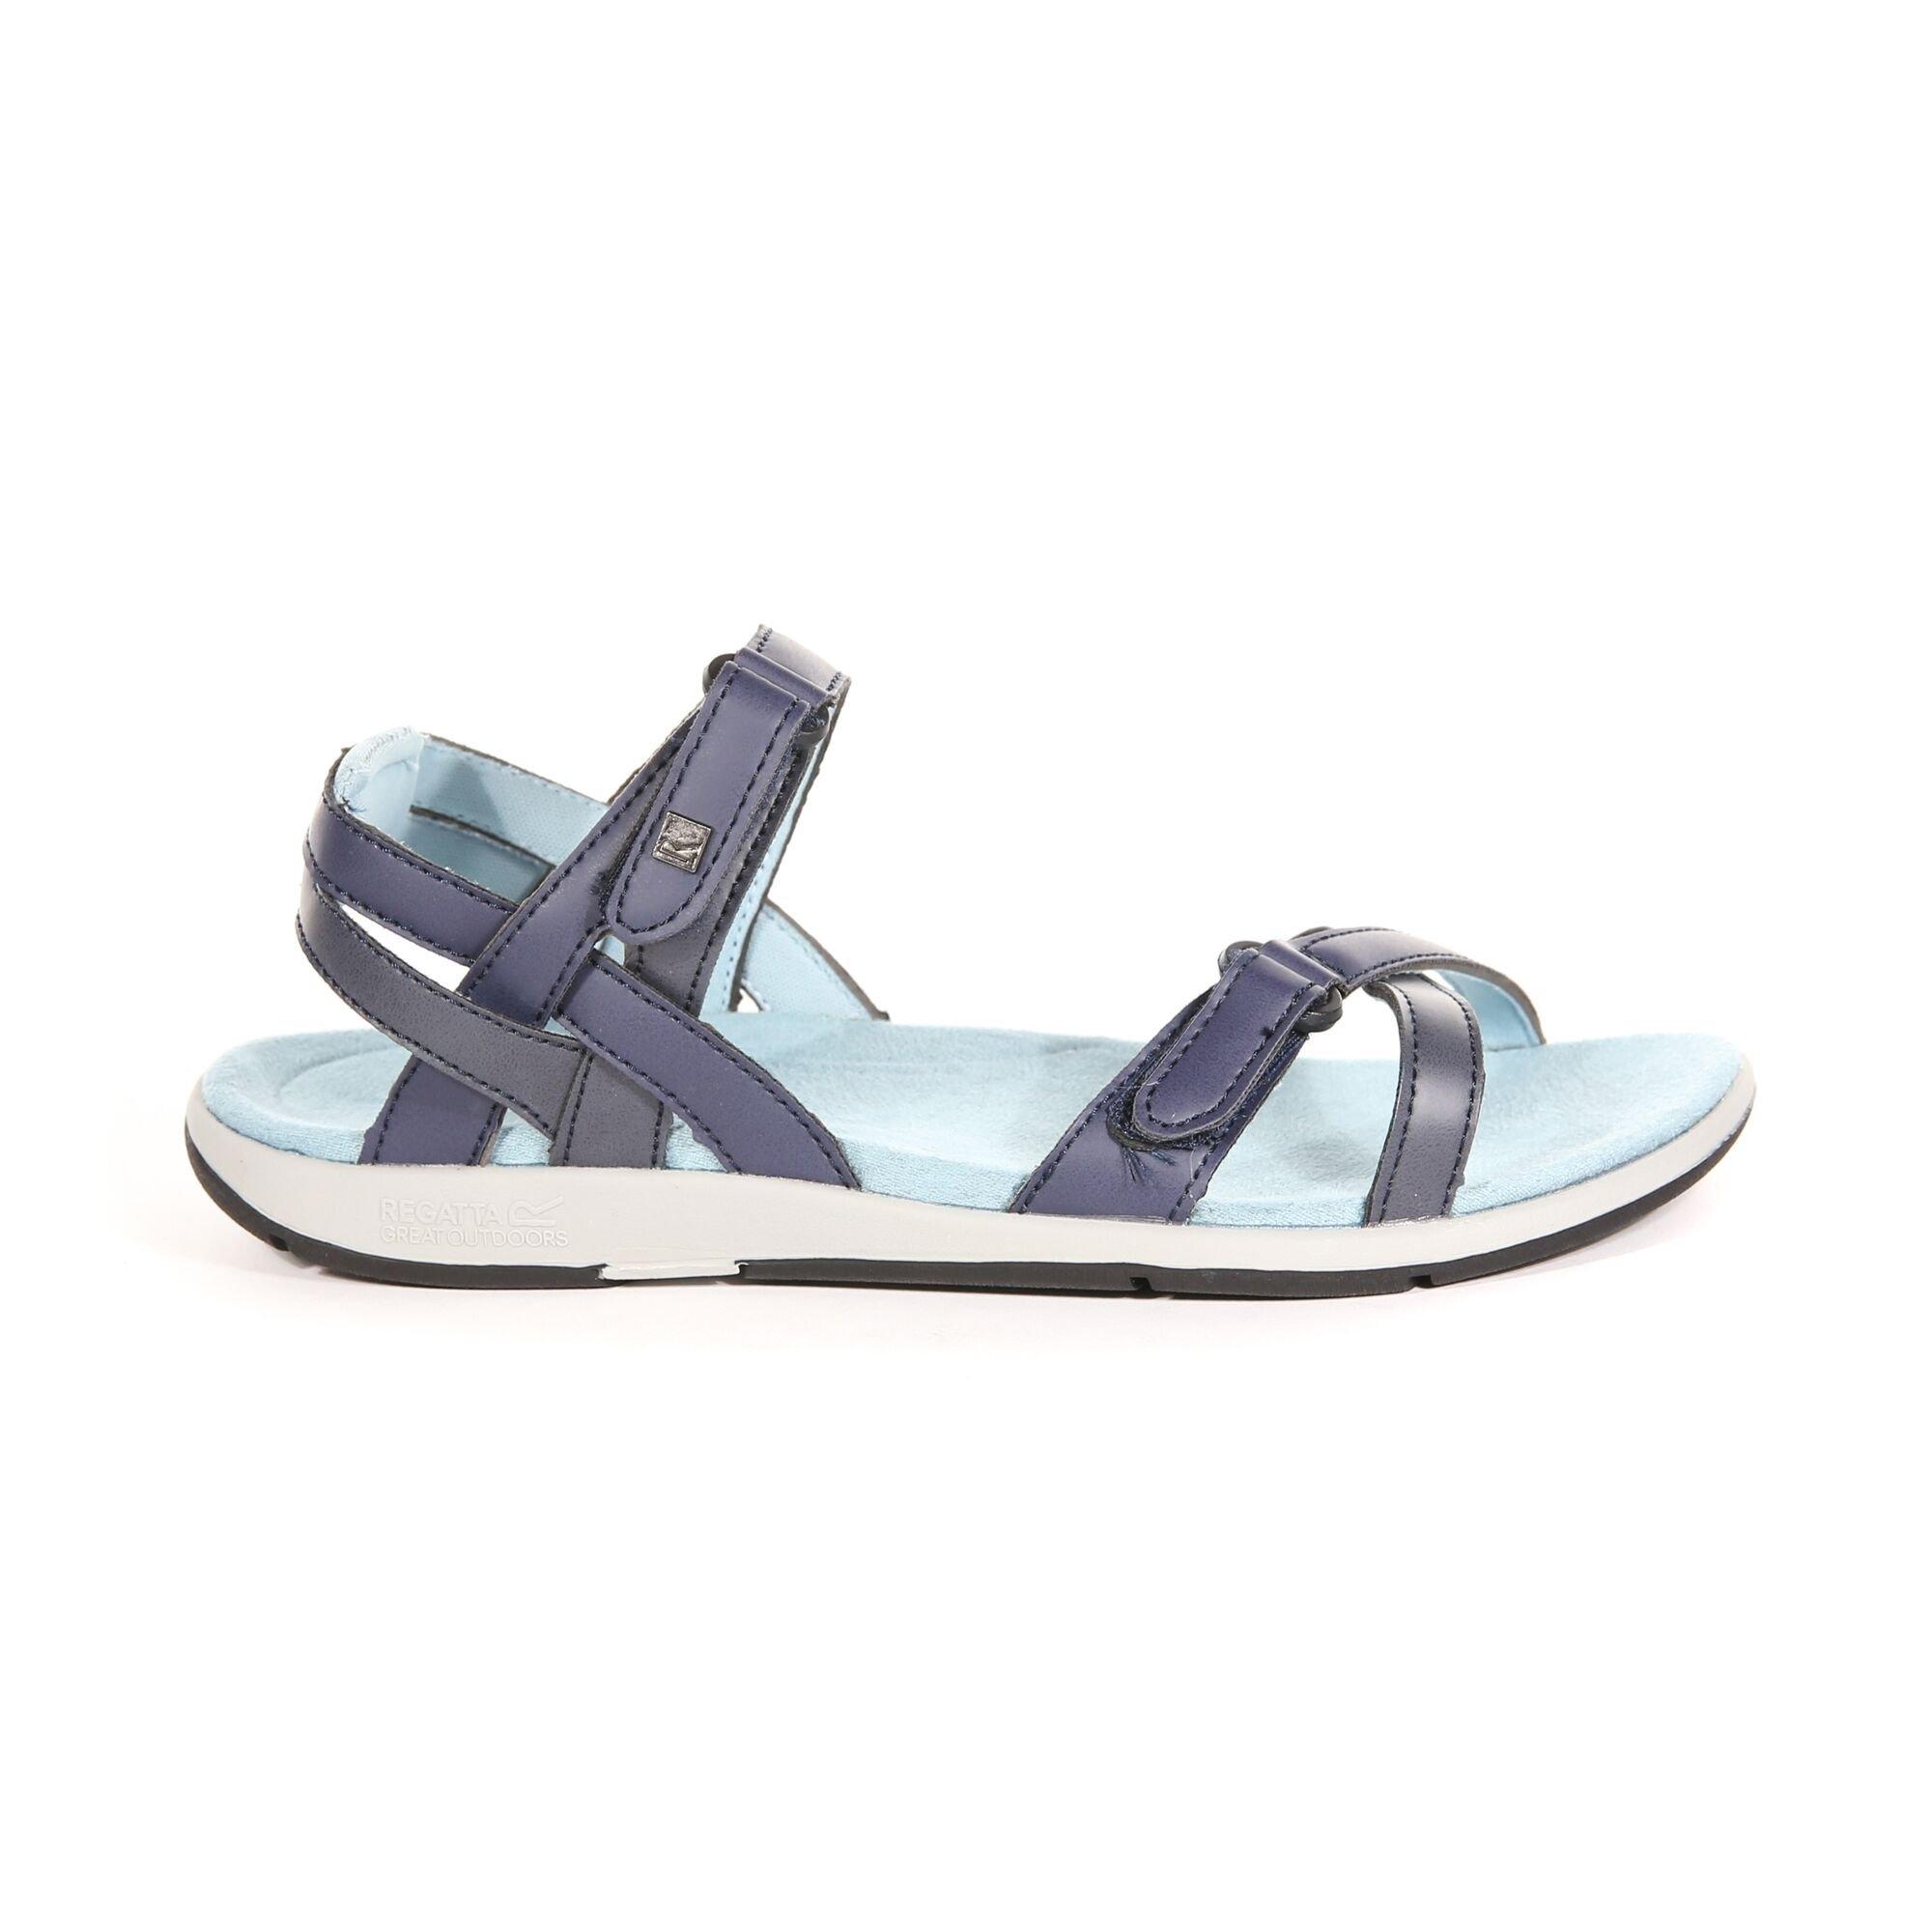 Regatta sandalen Great Outdoors dames n Lady Santa Cruz bij OTTO online kopen